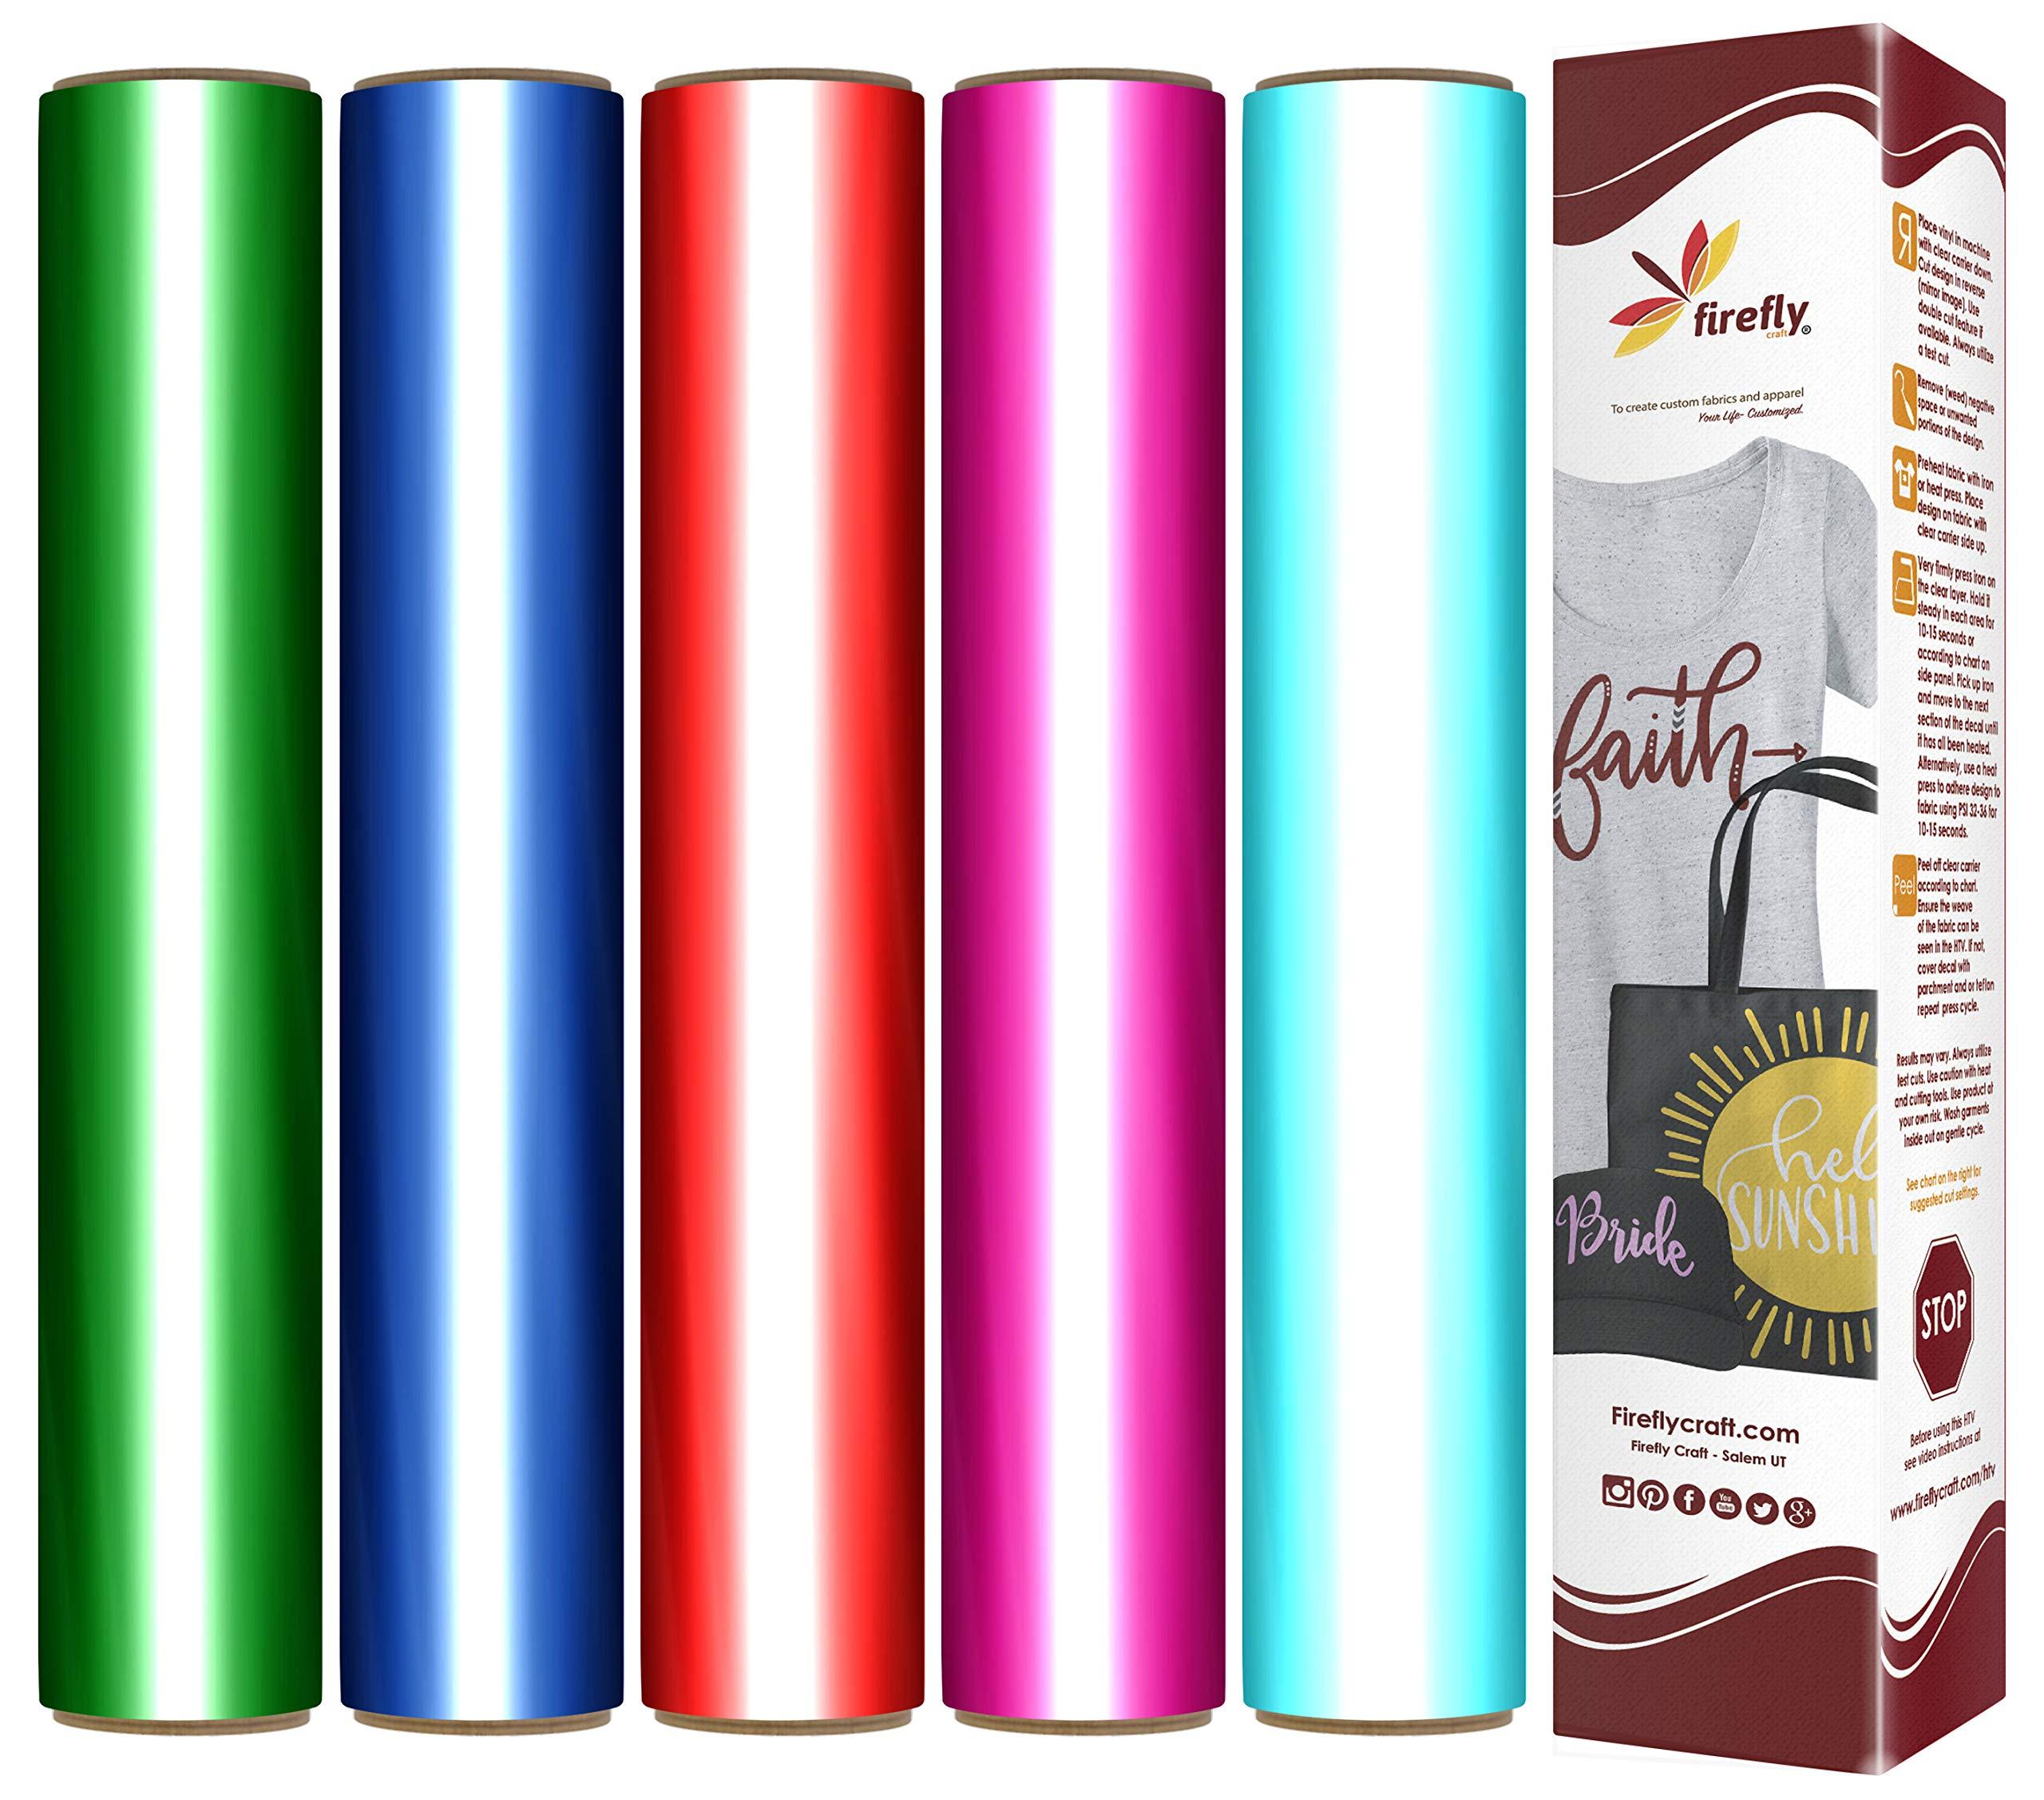 "Firefly Craft Elastic Foil Heat Transfer Vinyl Bundle   Rainbow Metallic HTV Vinyl Bundle   Iron On Vinyl for Cricut and Silhouette   Pack of 5 Best Selling Colors - 12"" x 20"" Each"